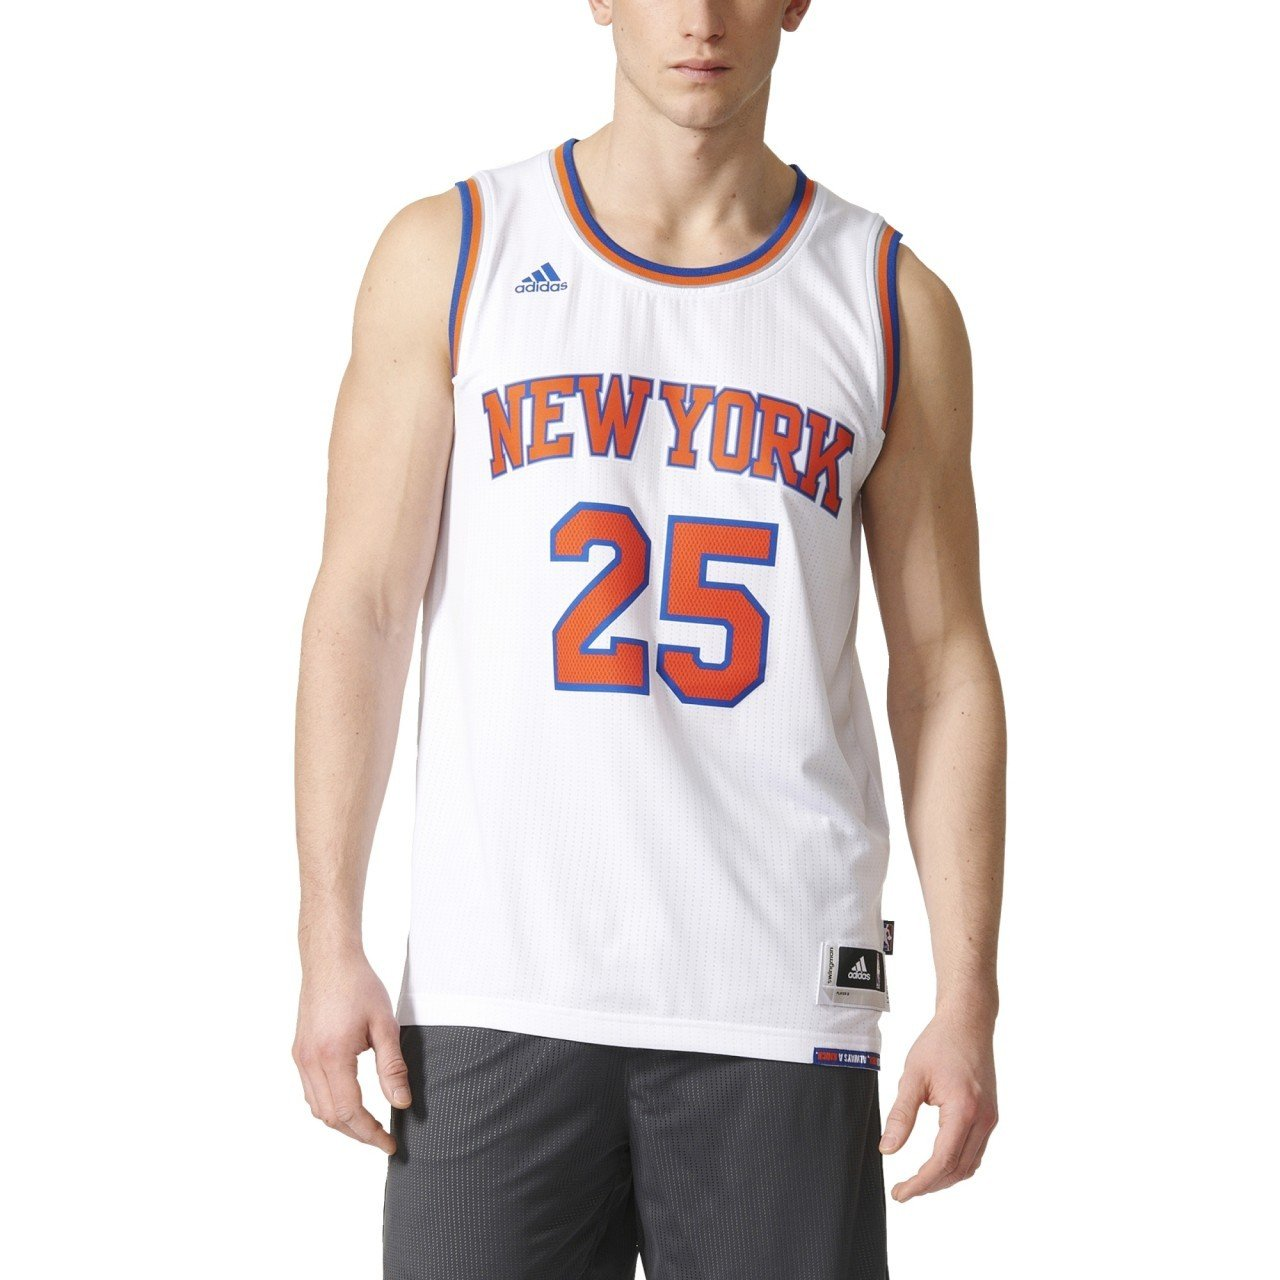 Adidas Int Swingman Trikot Basketball New York Knicks, Knicks, Knicks, Herren B01N5HHK4W Spieltrikots Empfohlen heute f5f1fa